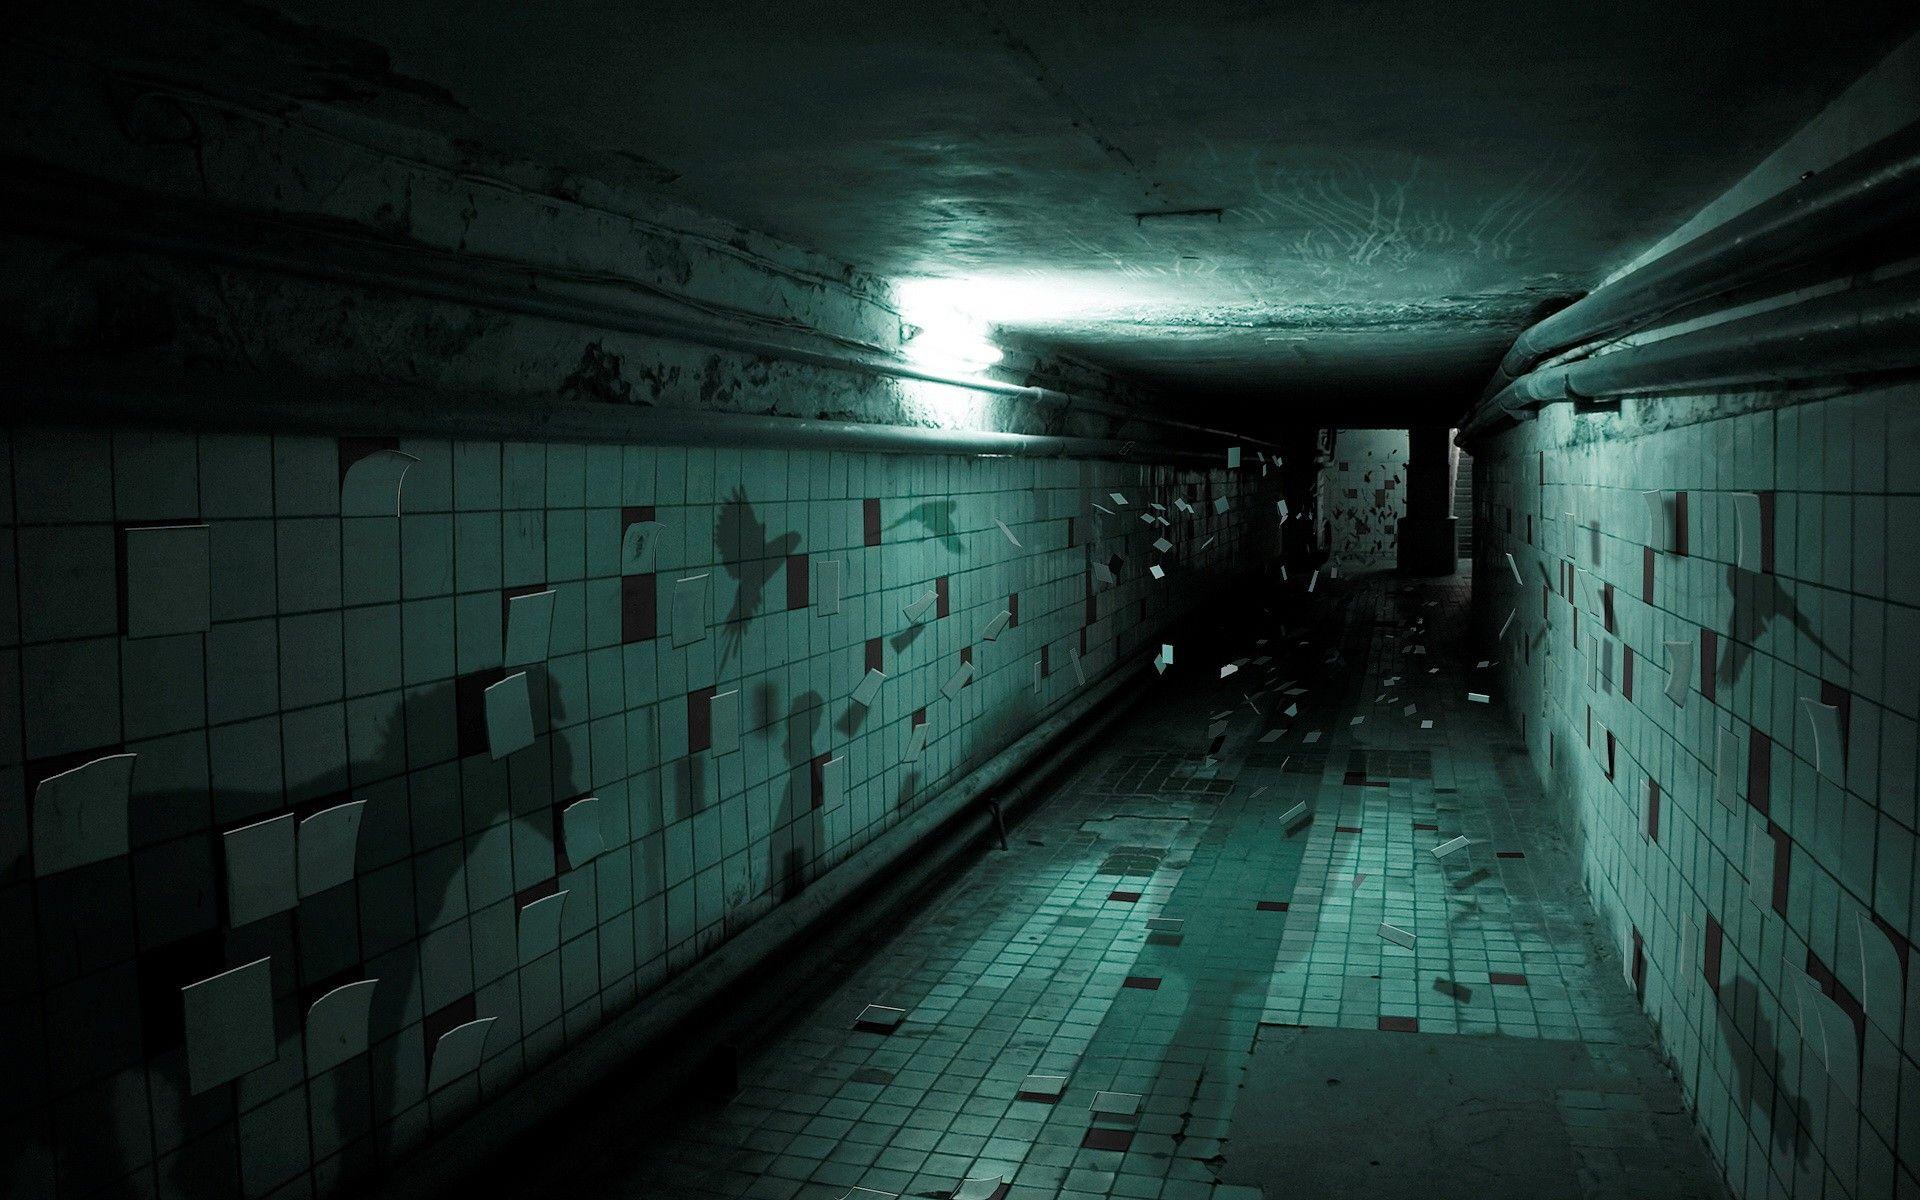 Dark hallway wallpaper  dark stairs render shadow hallway digital art wallpaper